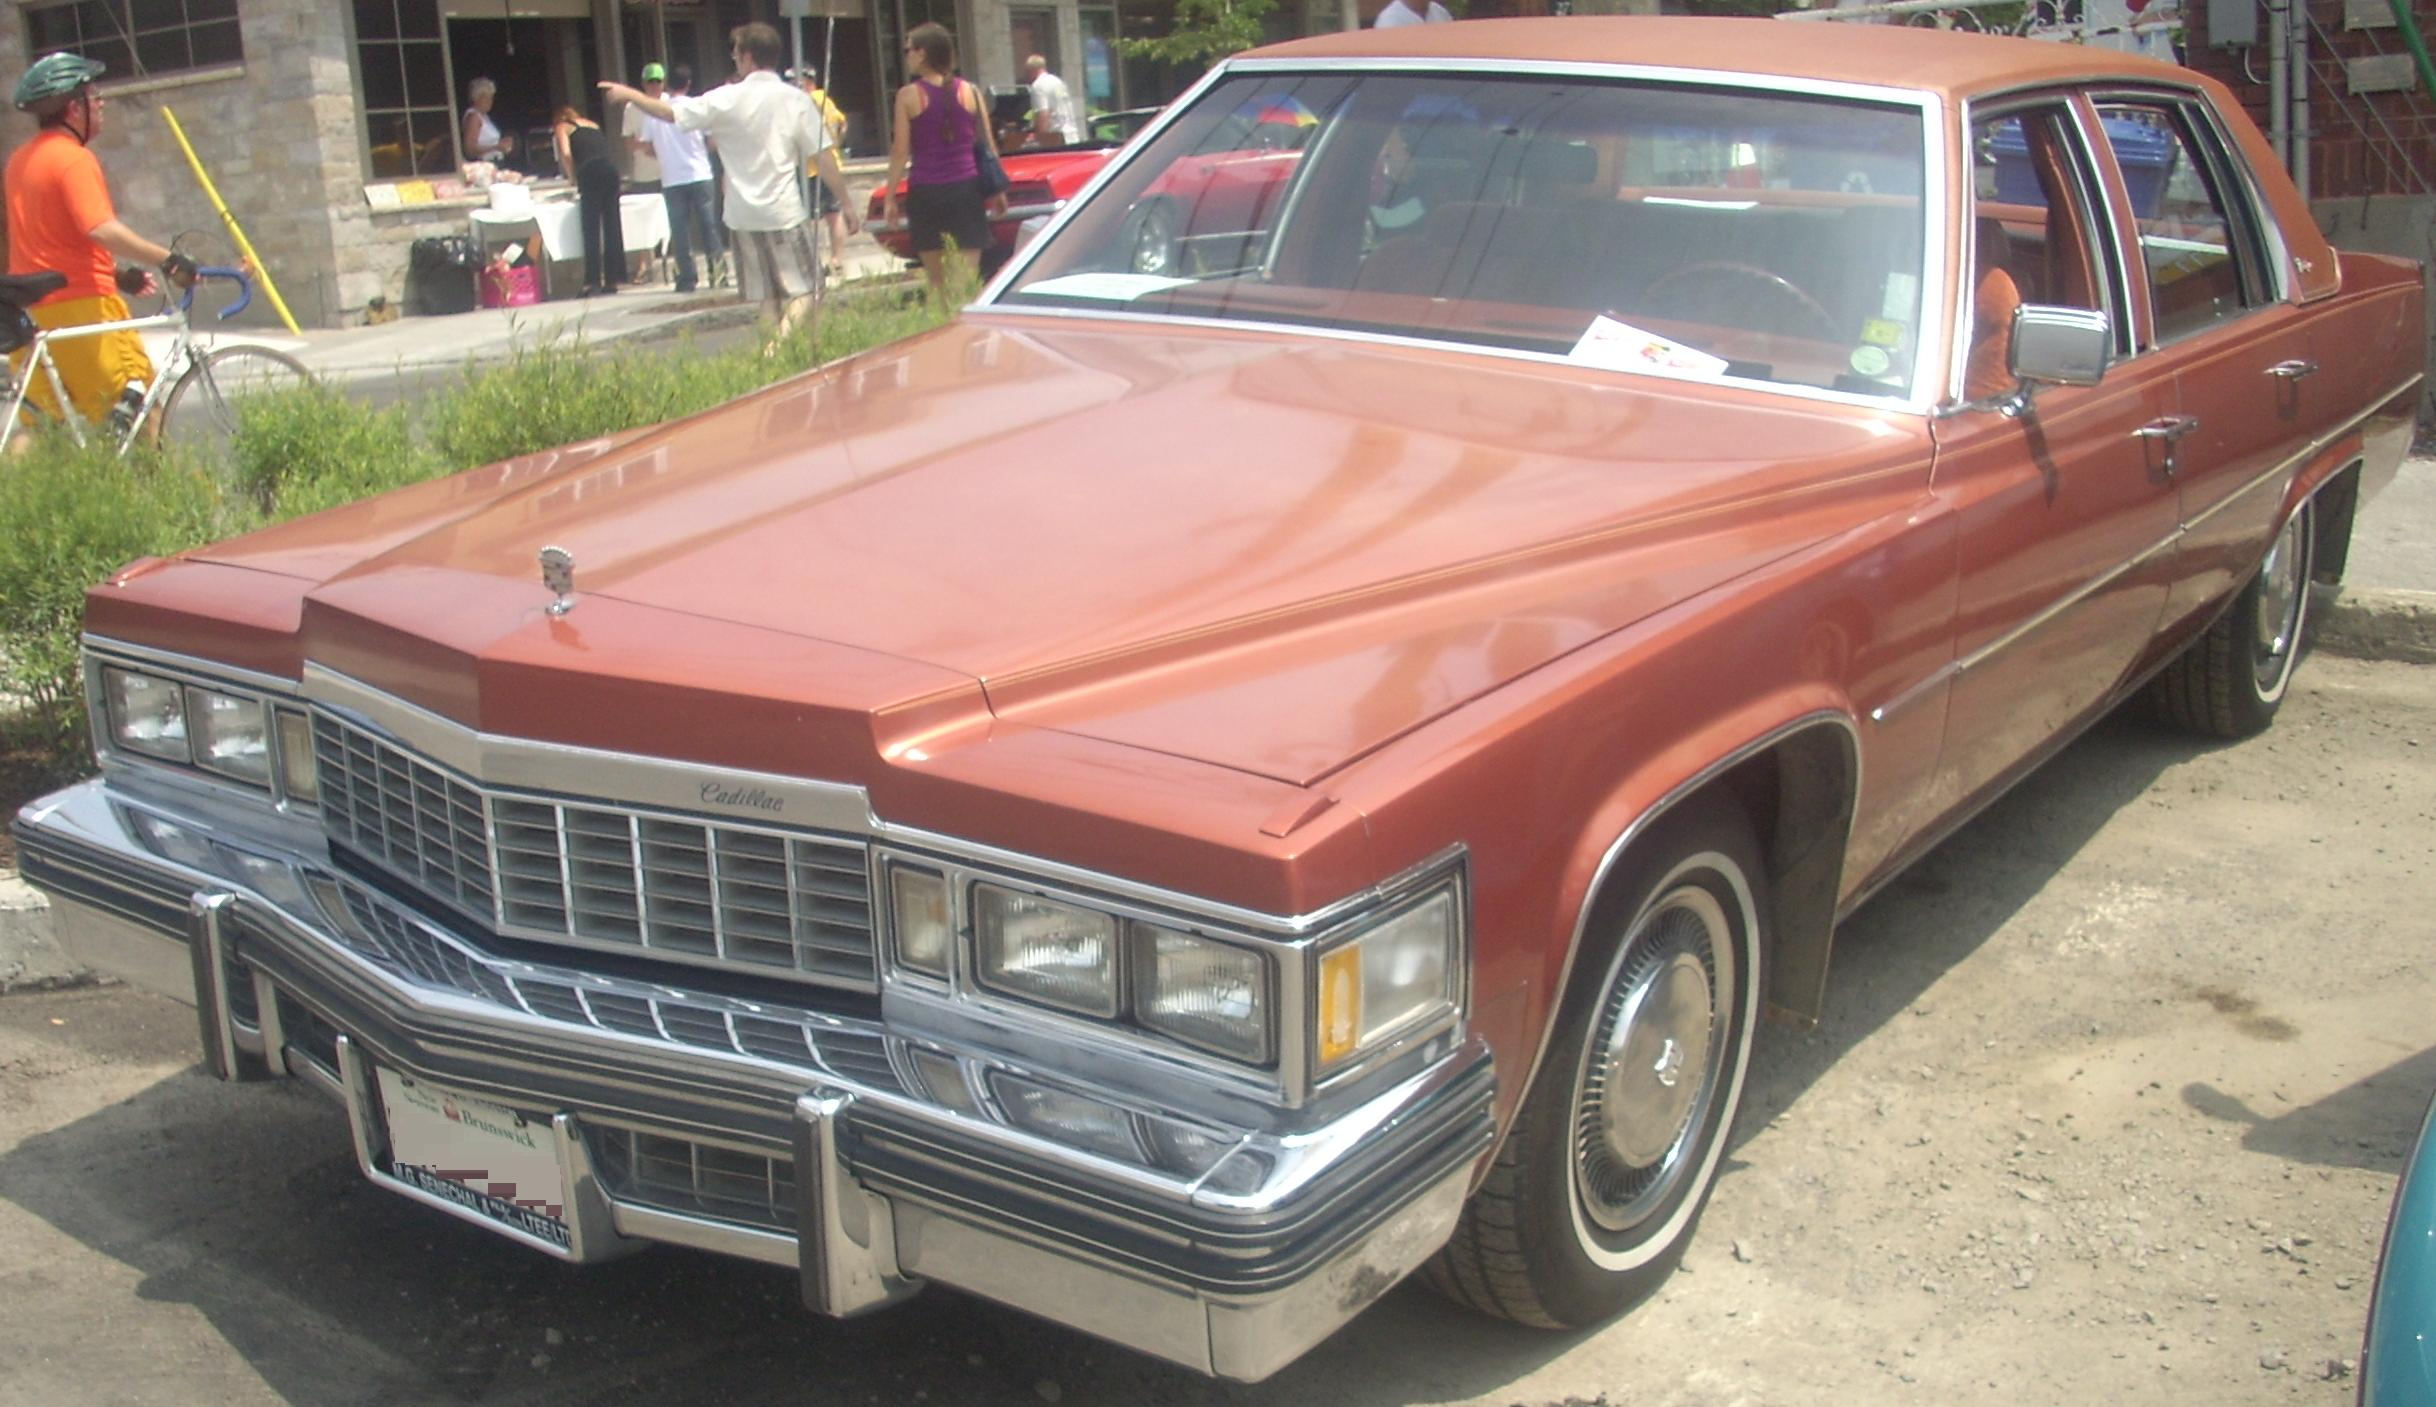 File:'77 Cadillac DeVille D'Elegance (Cruisin' At The Boardwalk '10